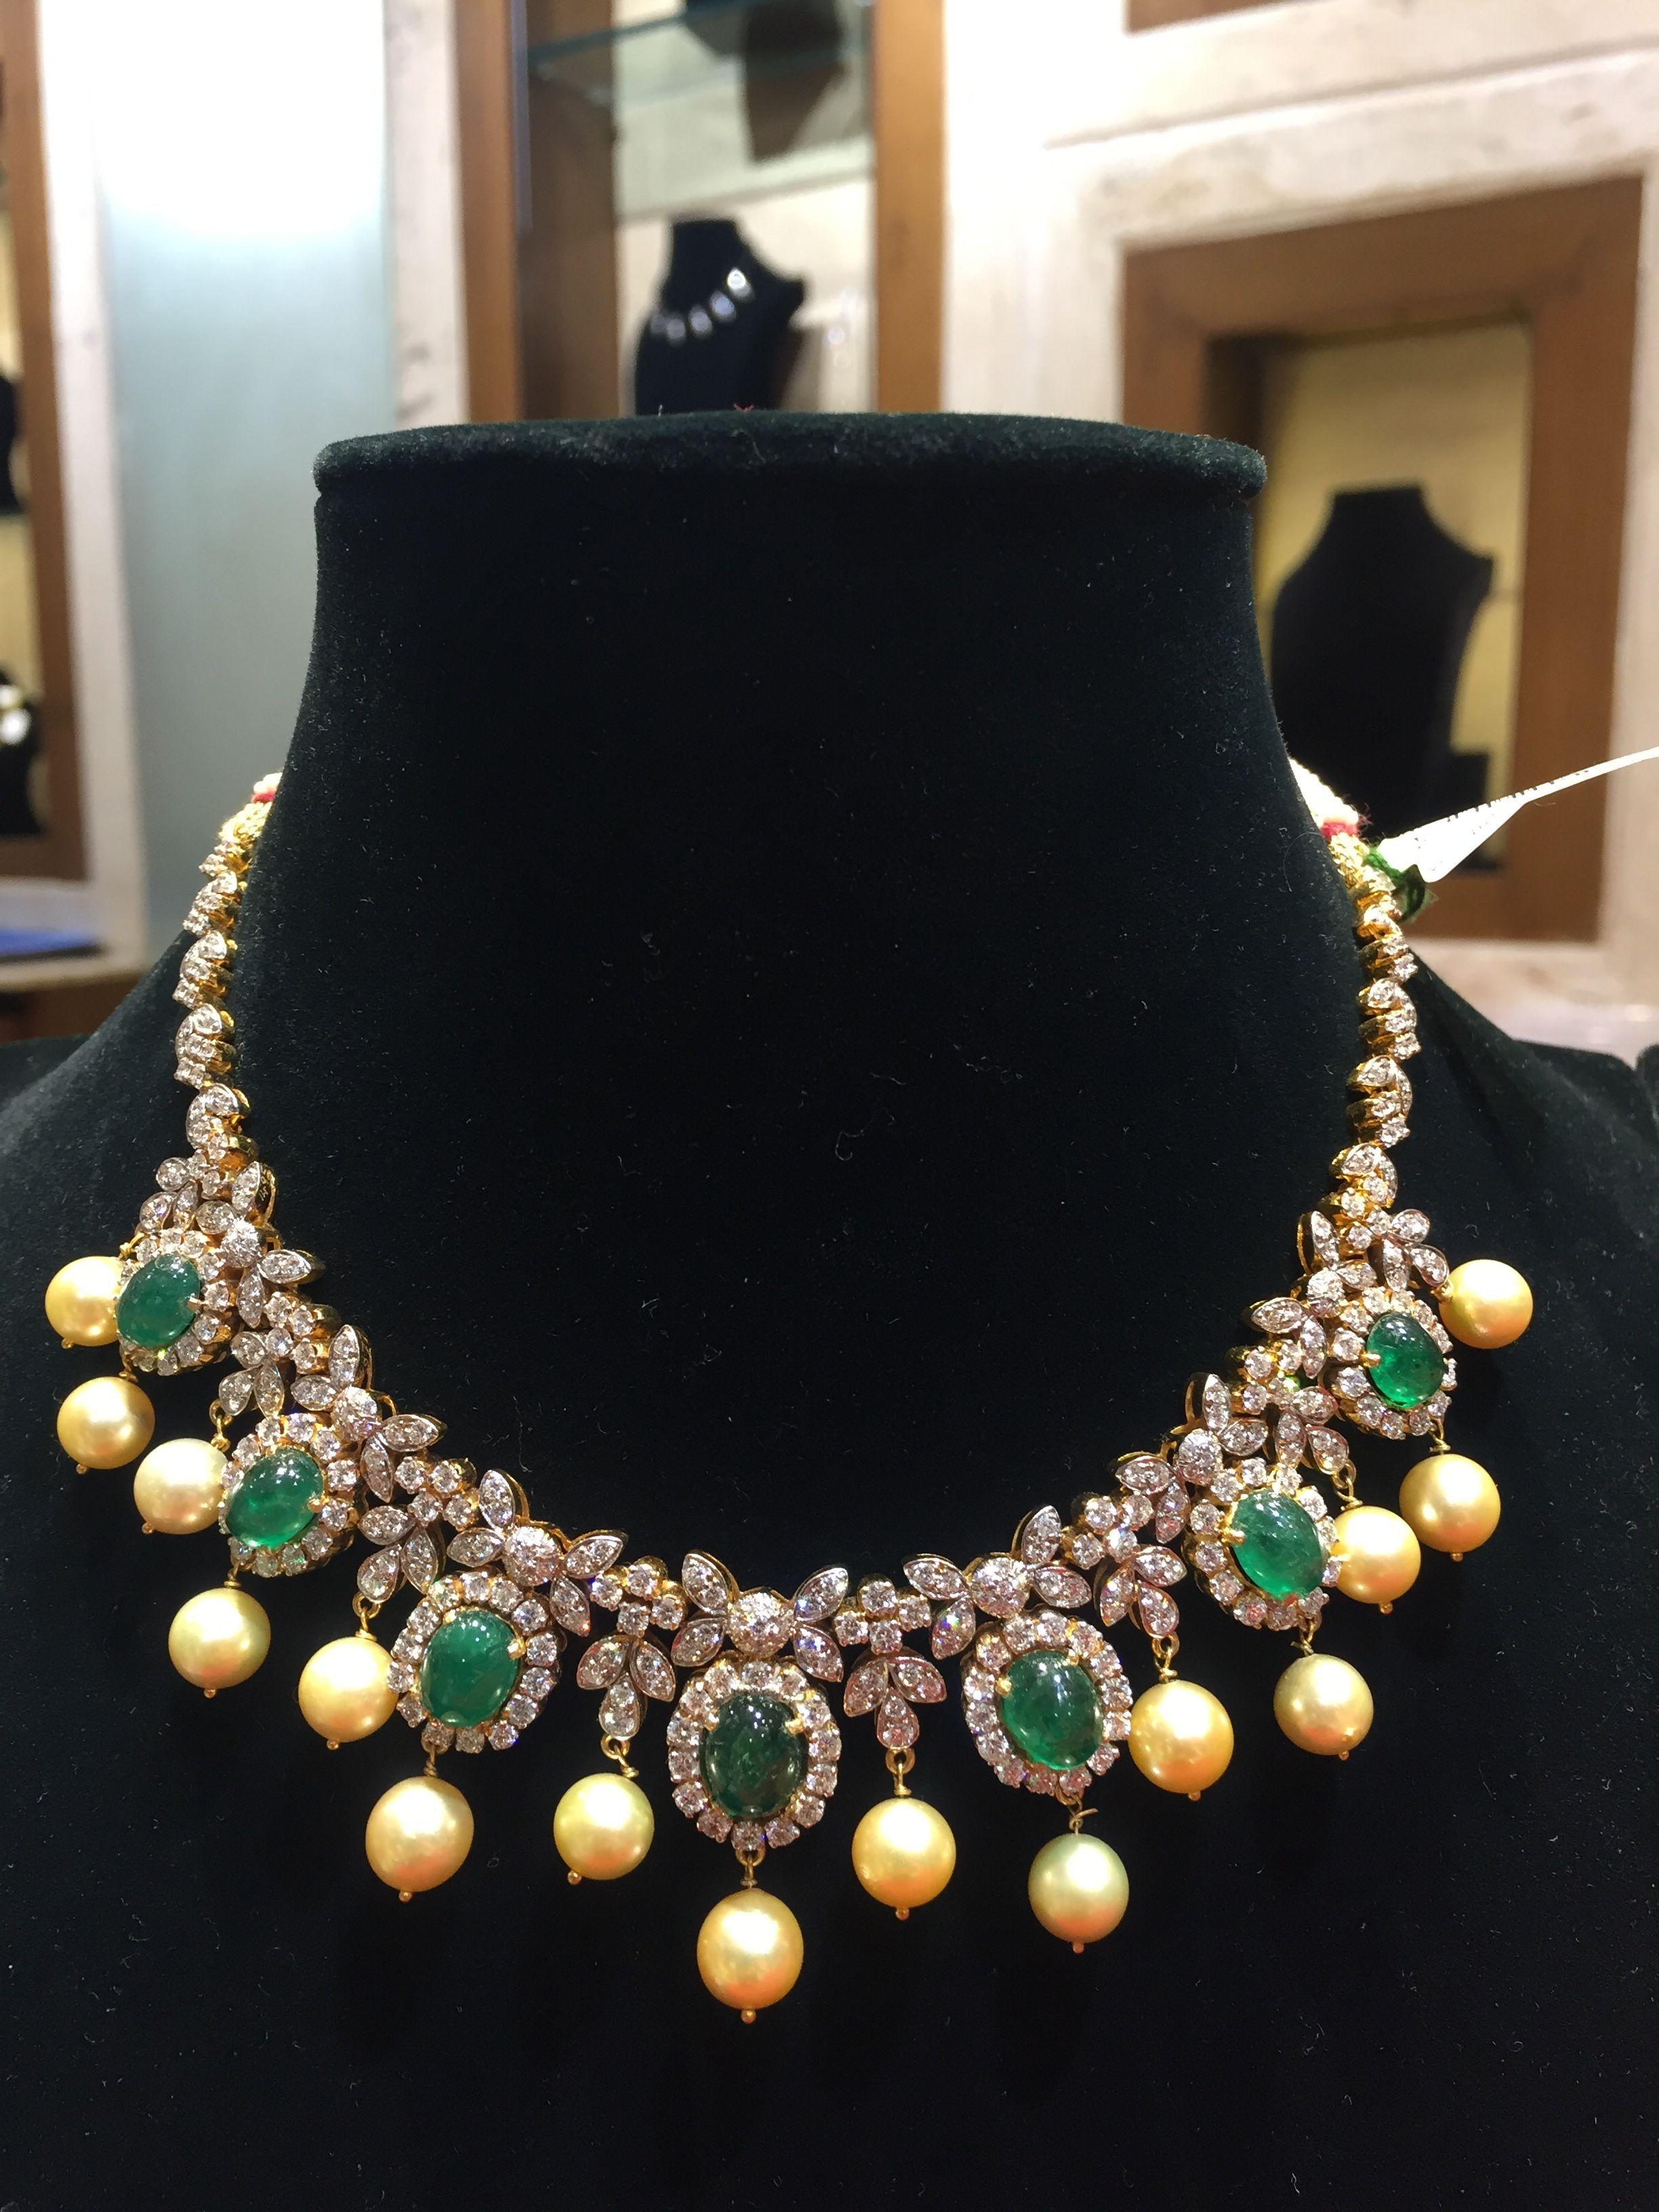 Without pearls Diamond necklace wedding, Diamond jewelry